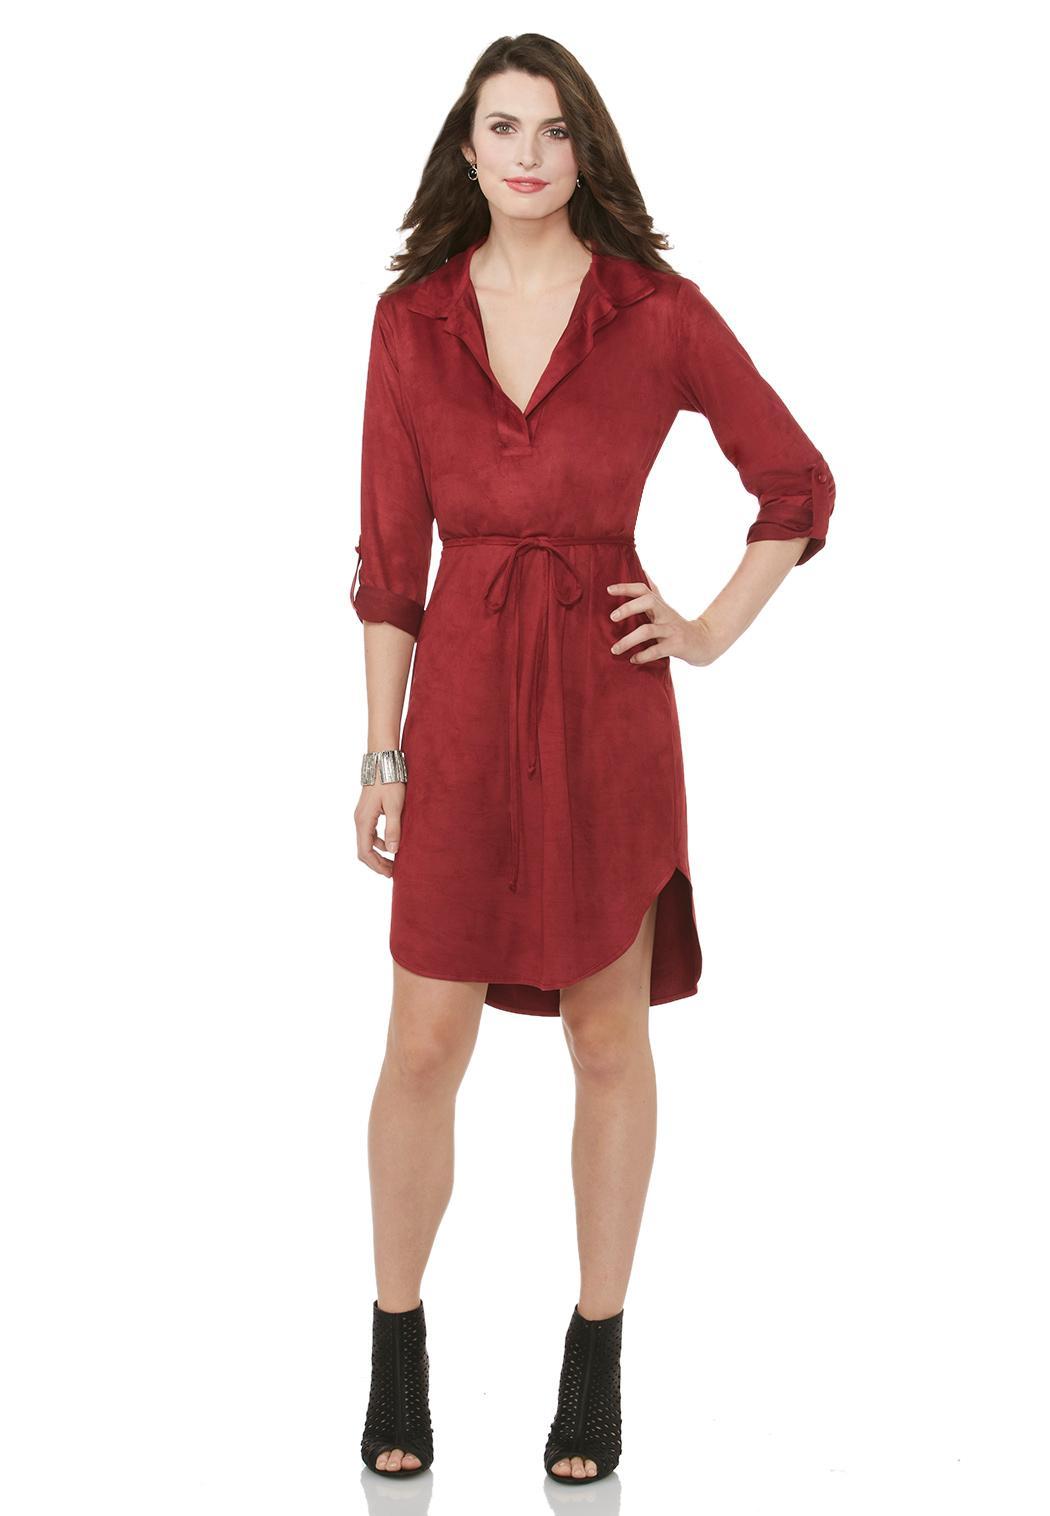 Faux Suede Shirt Dress Dresses Cato Fashions